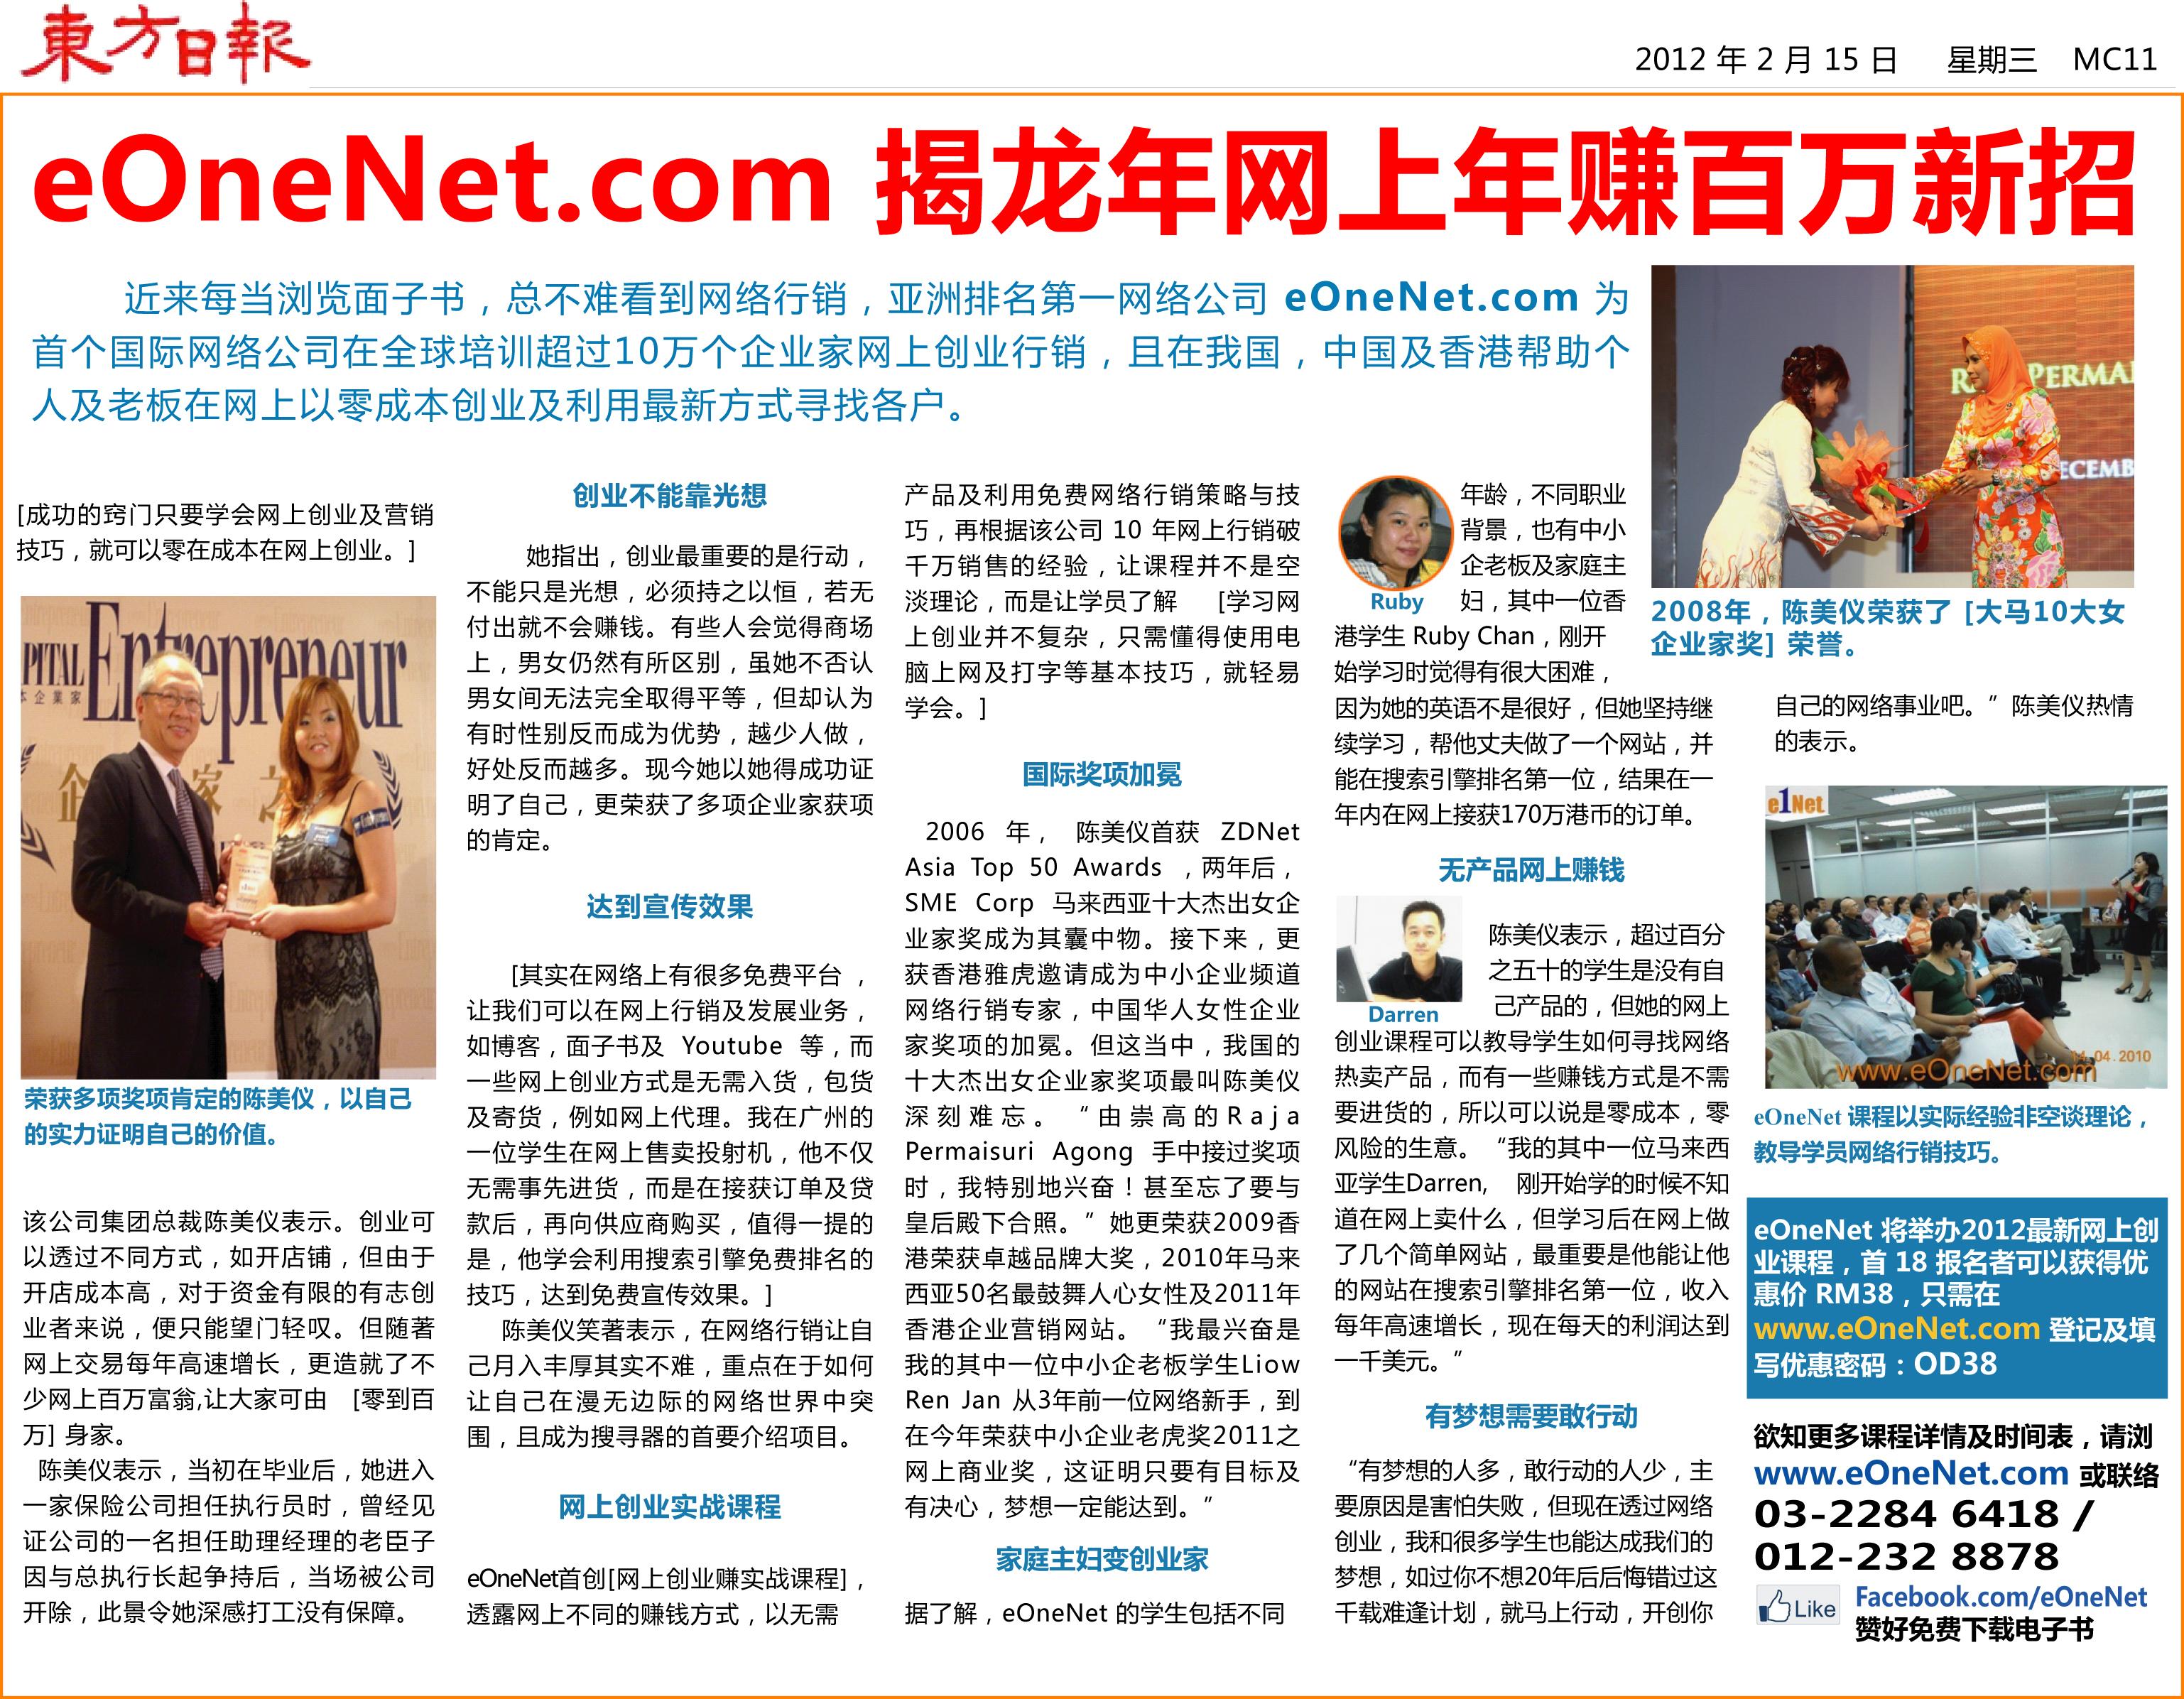 eOneNet.com 揭龙年网上年赚百万新招